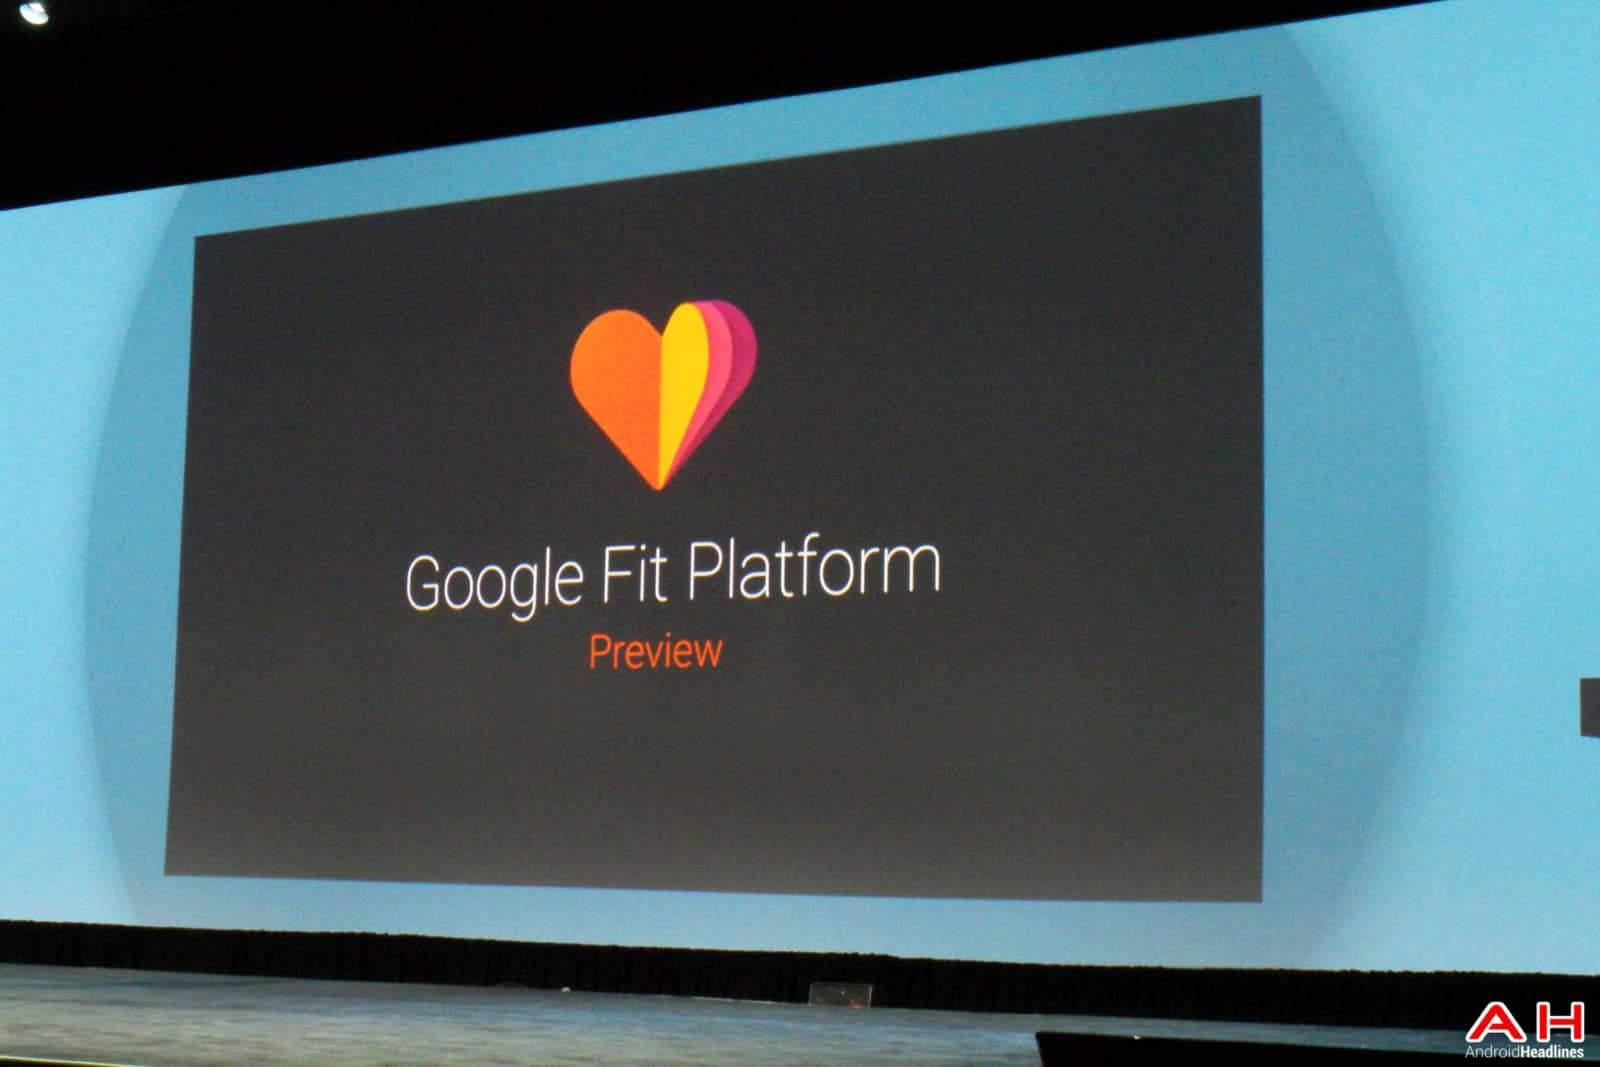 AH Google IO 2014 Fit Platform (800 of 4)